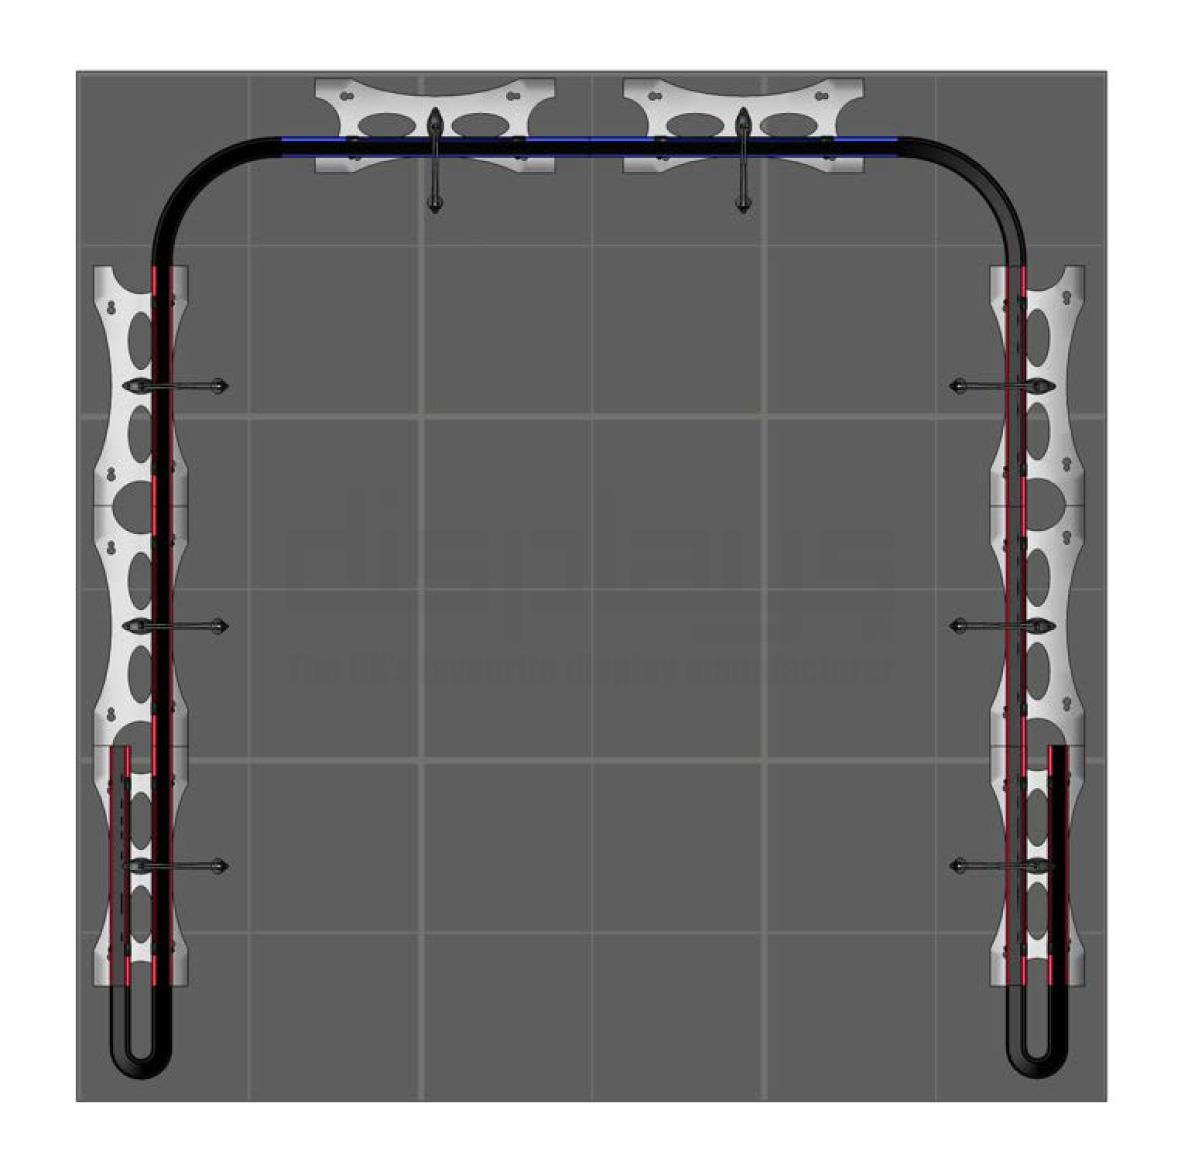 Twist 3m x 3m Exhibition Stand - U Shape - Kit 58